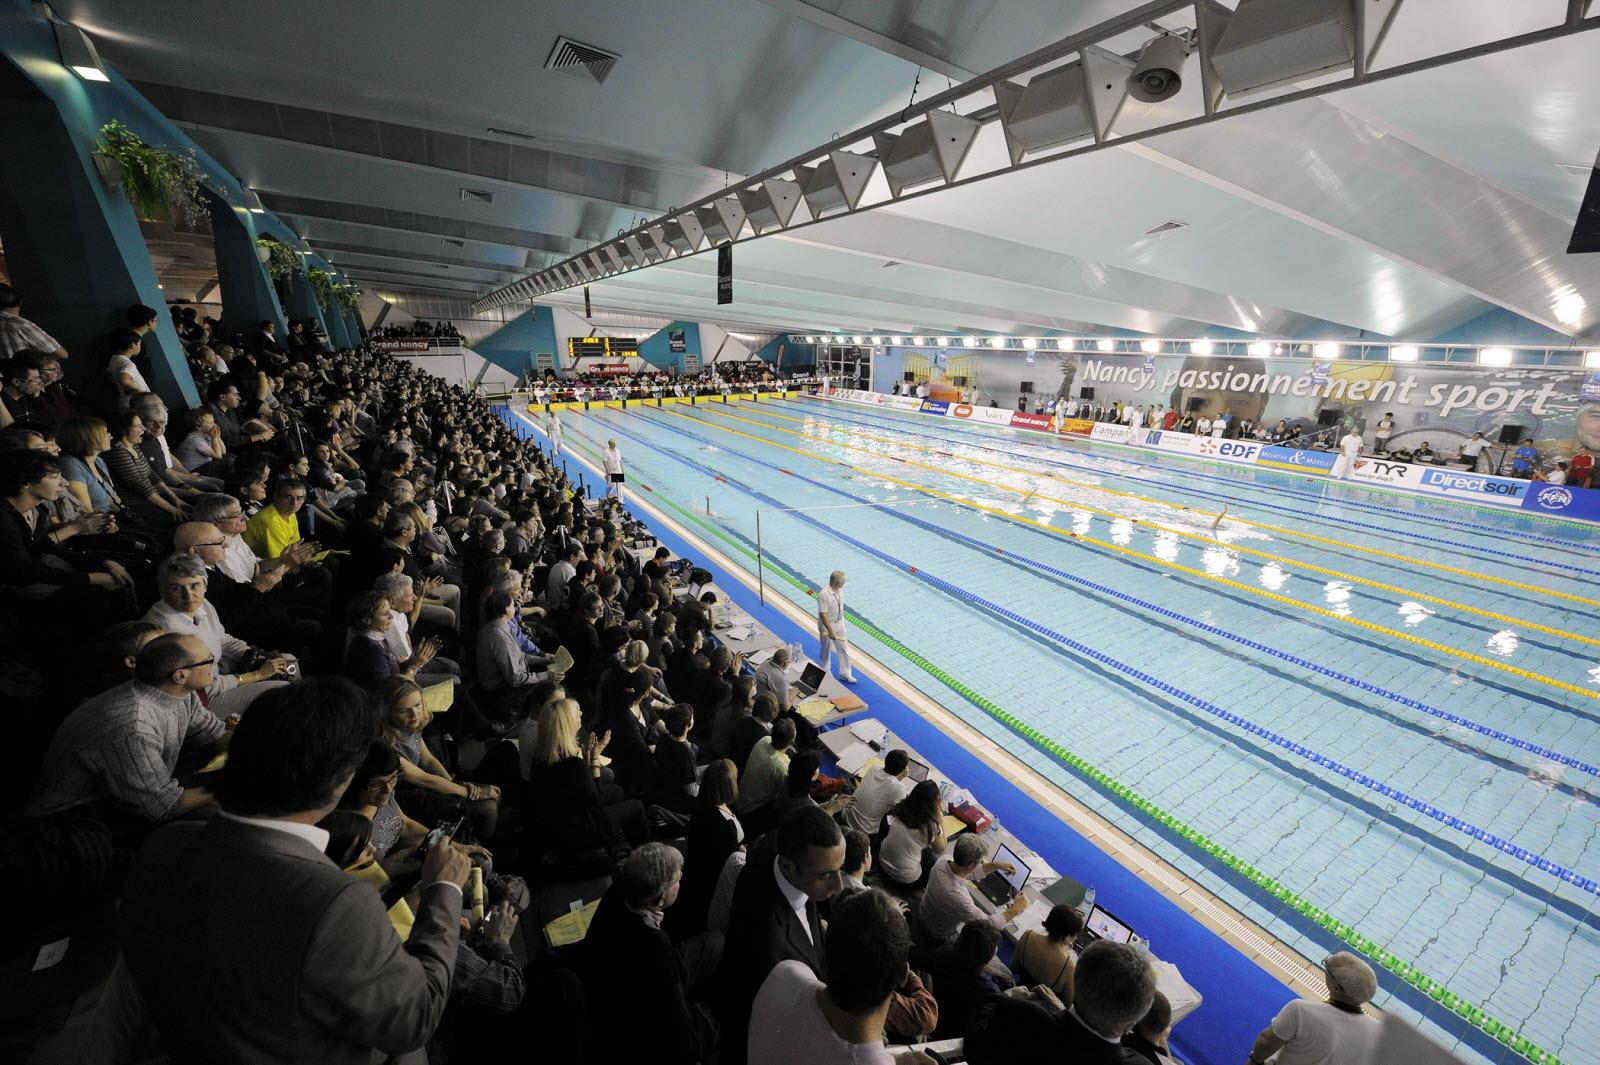 Sport Lorrain | Alfred Nakache, Le « Nageur D'auschwitz » concernant Piscine Nakache Montpellier